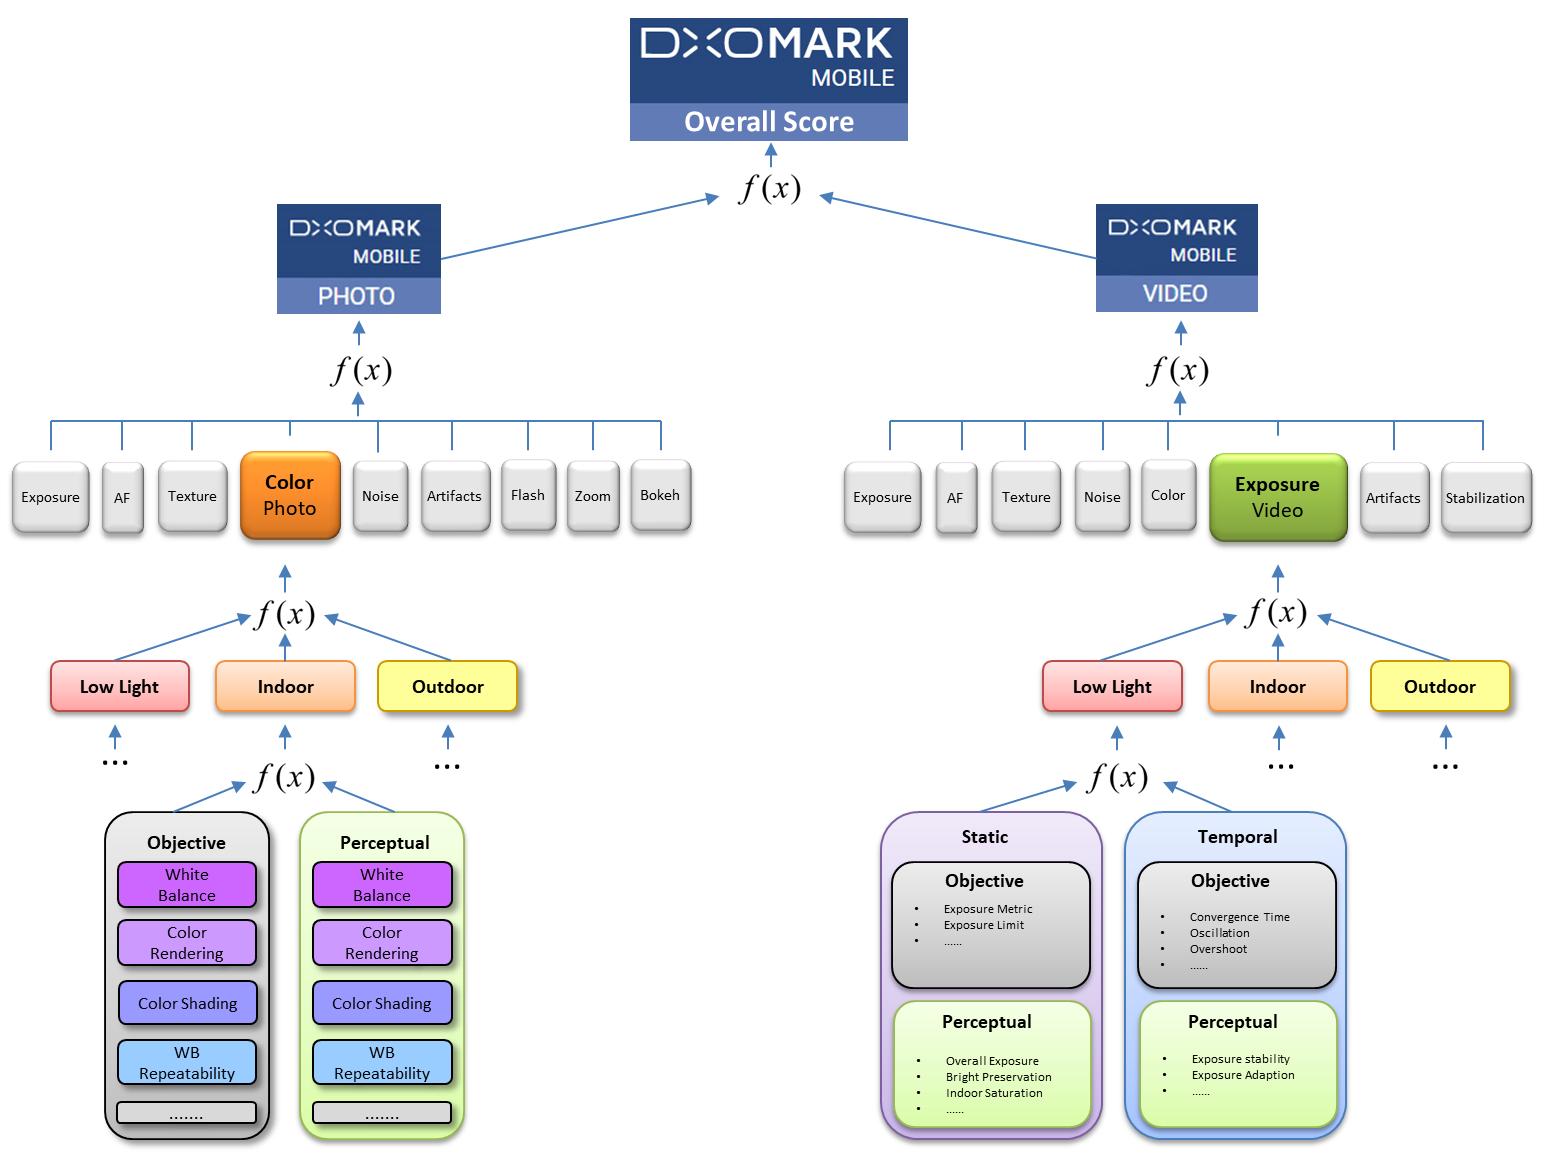 How Dxomark Mobile Scores Smartphone Cameras Dxomark